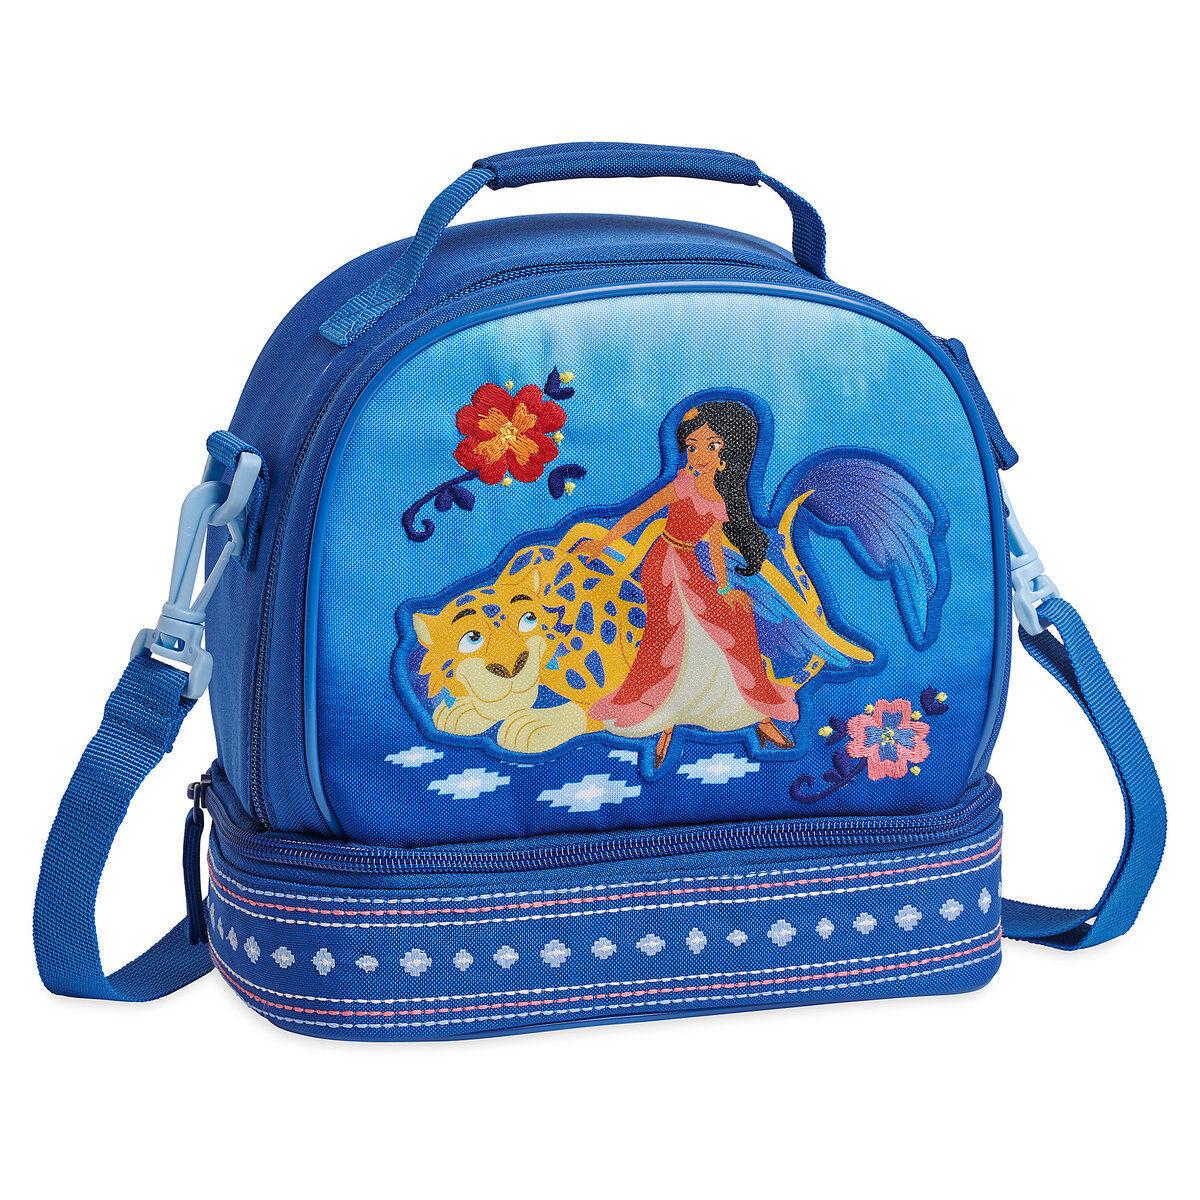 Disney Store Elena of Avalor Princess School Lunch Tote Bag